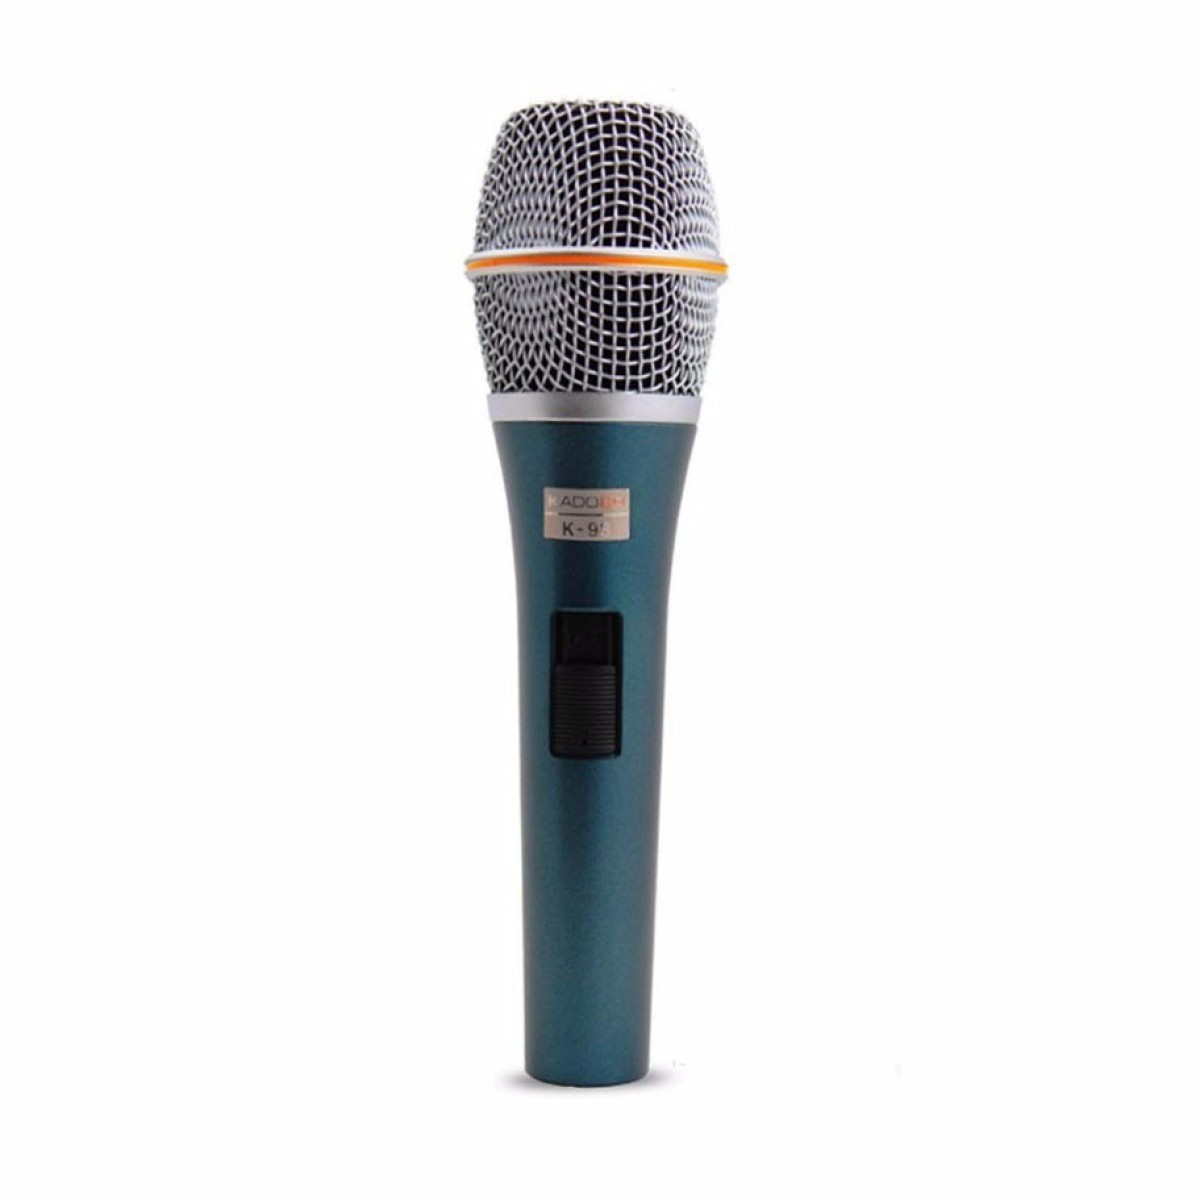 Microfone Profissional K 98 Hipercardioide - Kadosh (K98)